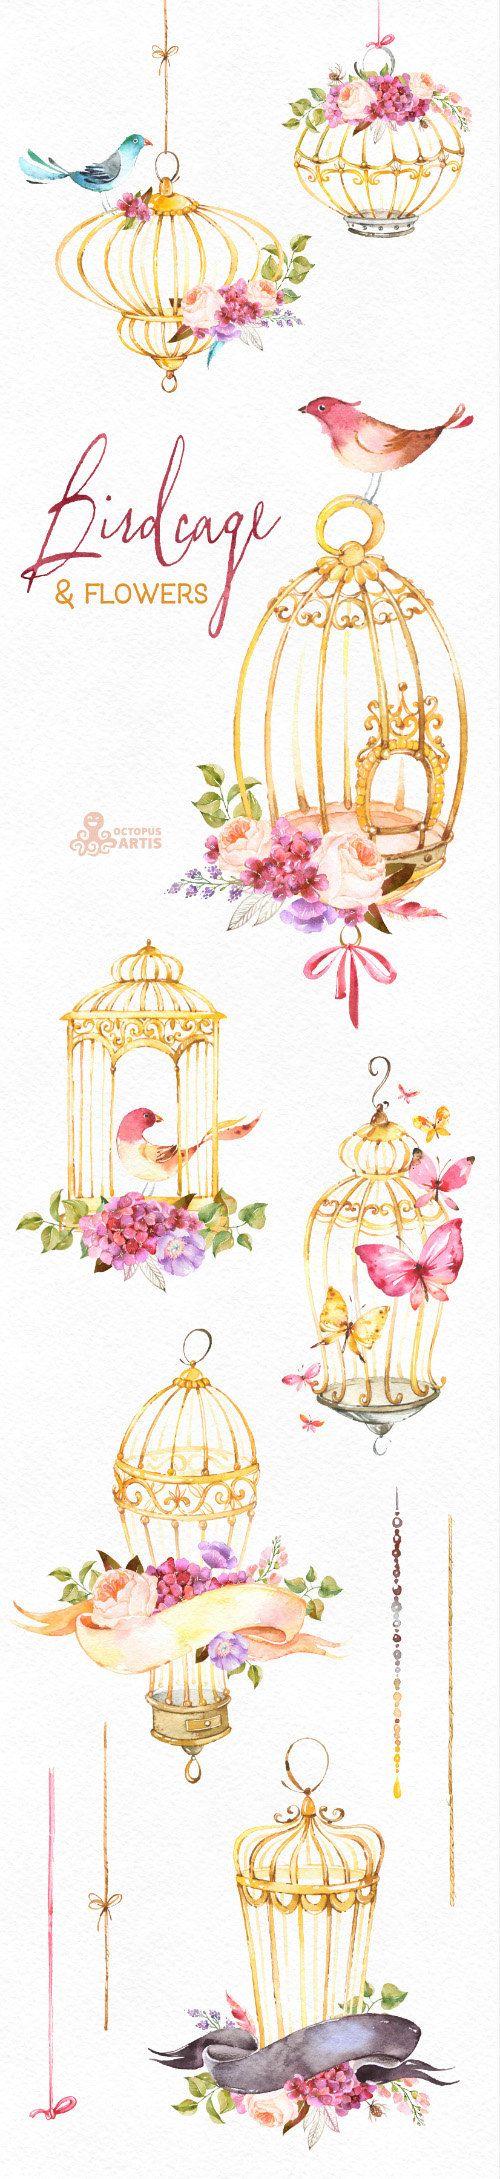 Jaula y flores. Acuarela Floral clipart aves rosas